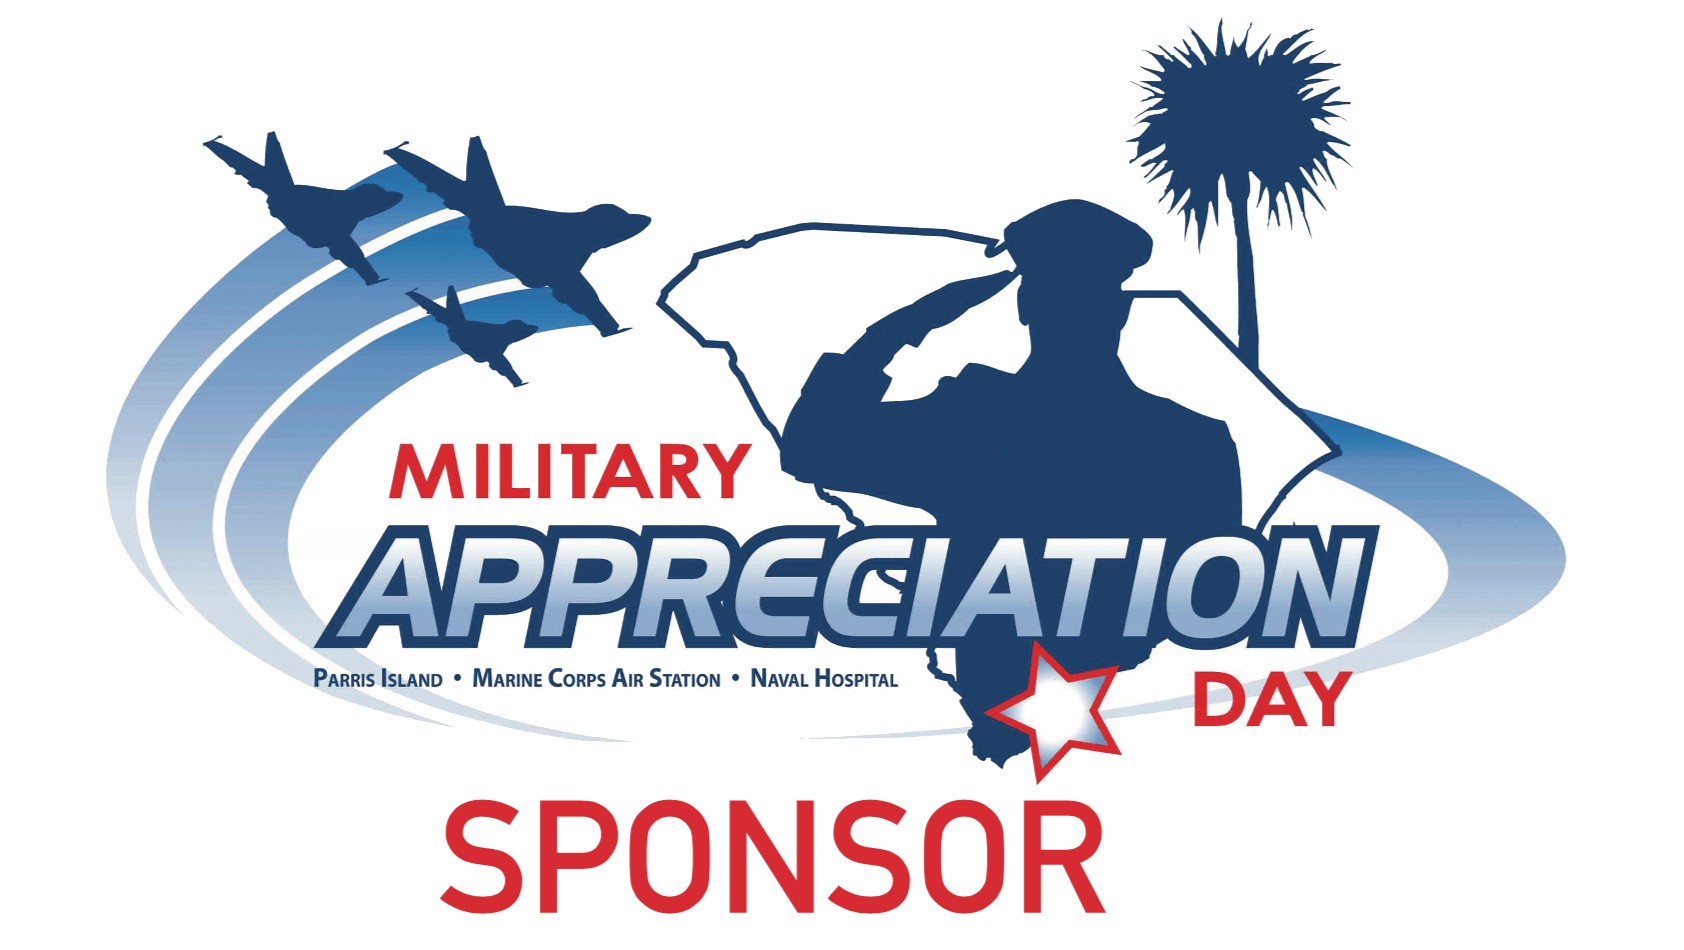 Military Appreciation Sponsor